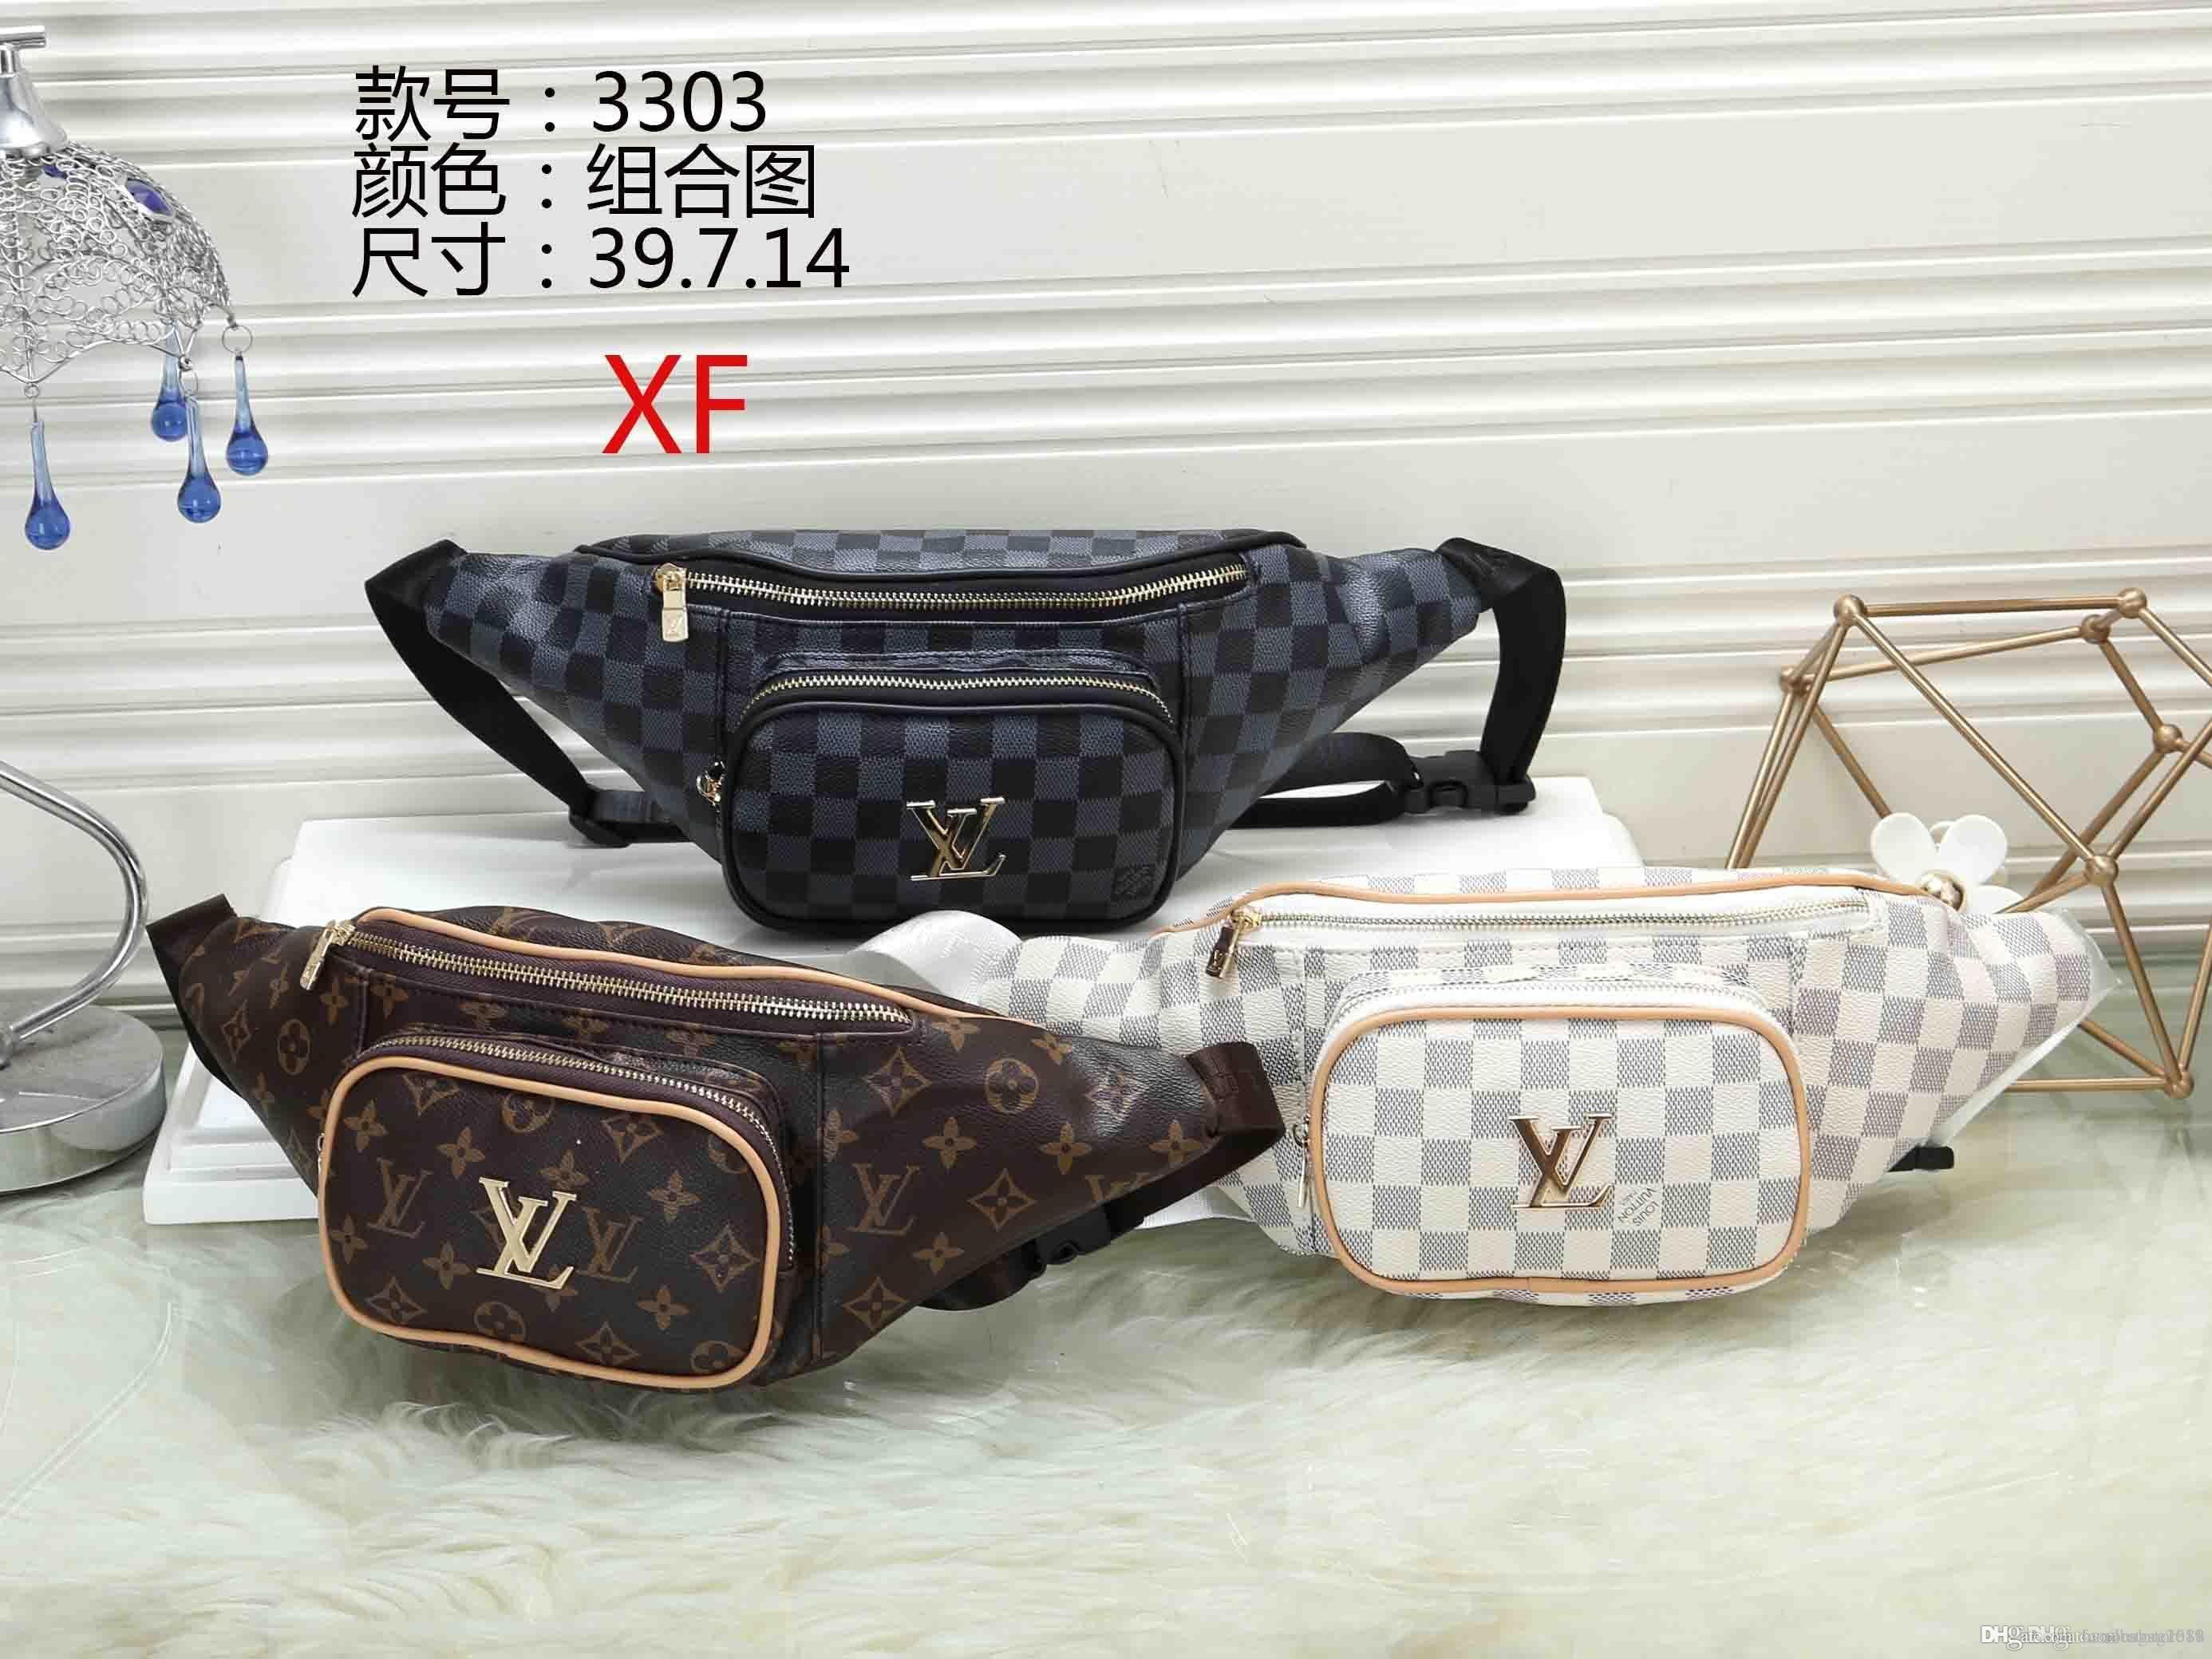 2019 styles Handbag Famous Name Fashion Leather Handbags Women Tote Shoulder Bags Lady Leather Handbags M Bags purse wallet purse 3303